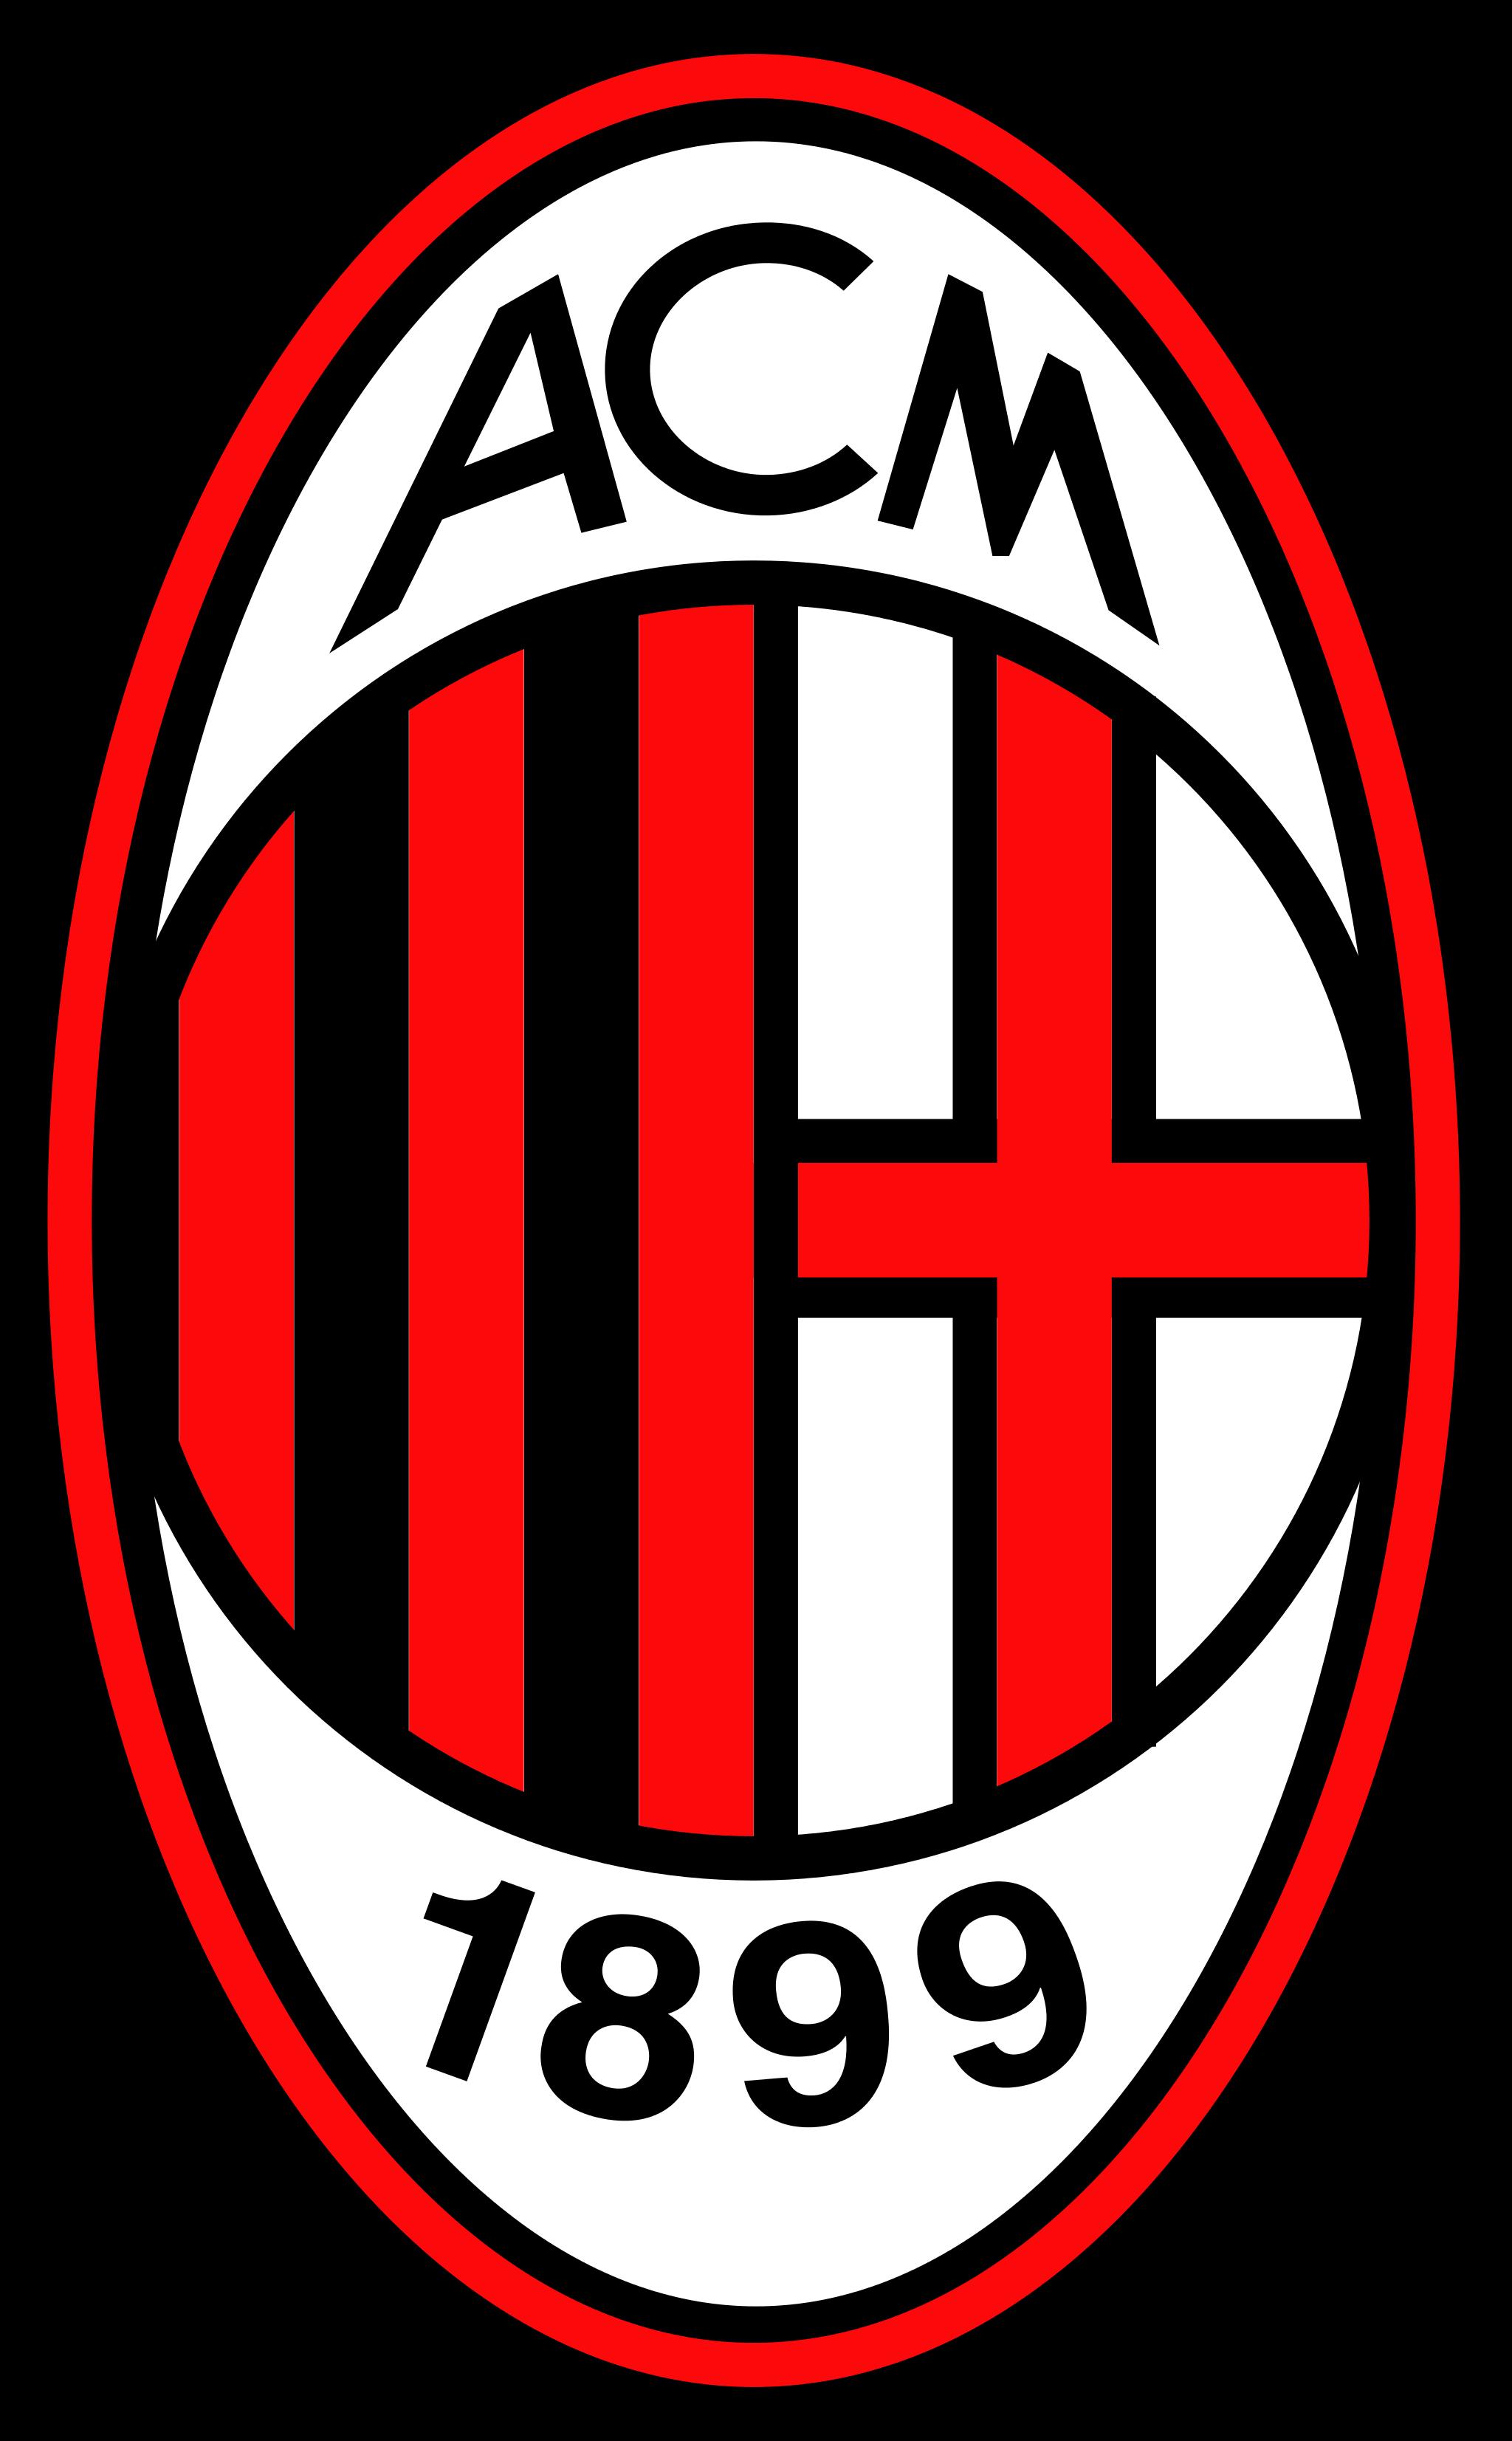 milan logo 1 - Milan Logo - Milan Escudo